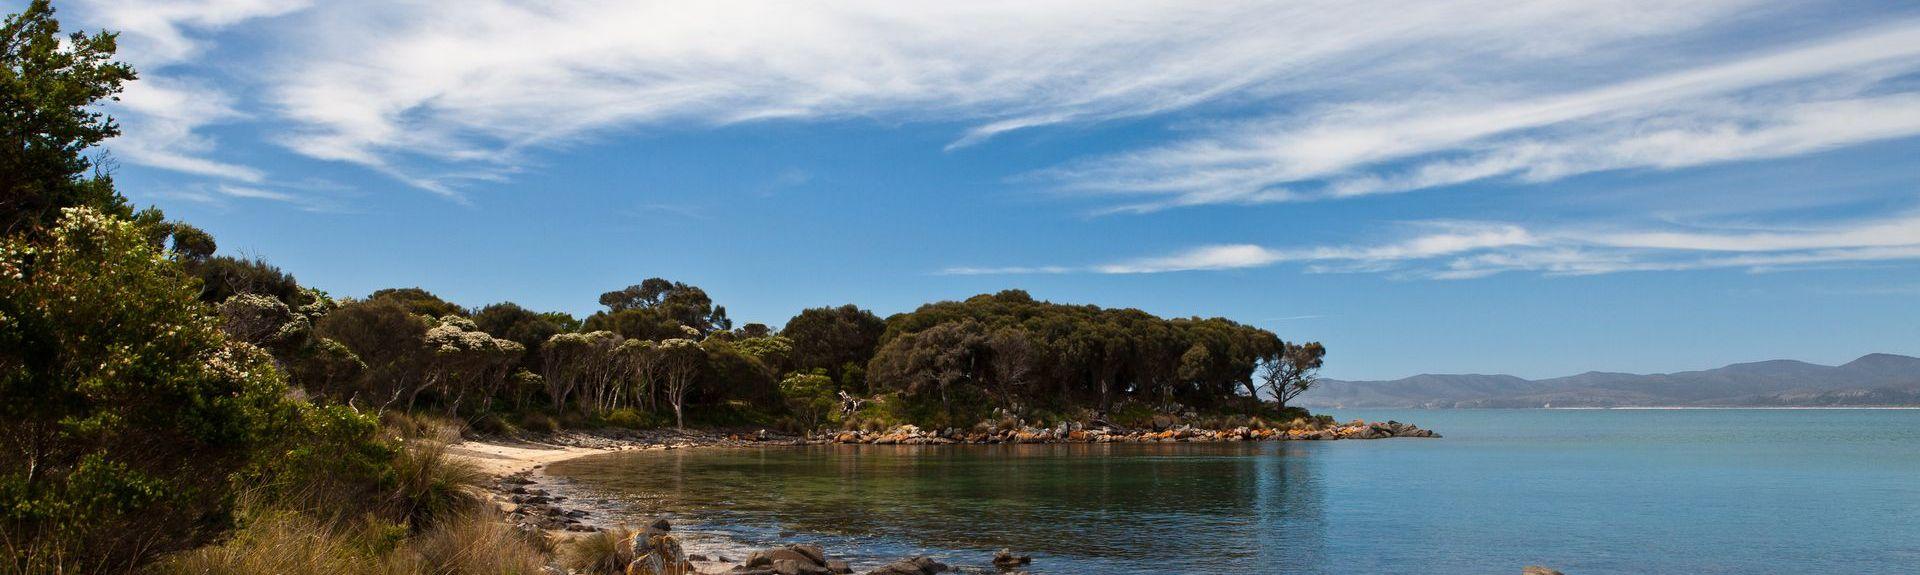 Port Sorell, Tasmania, Australia